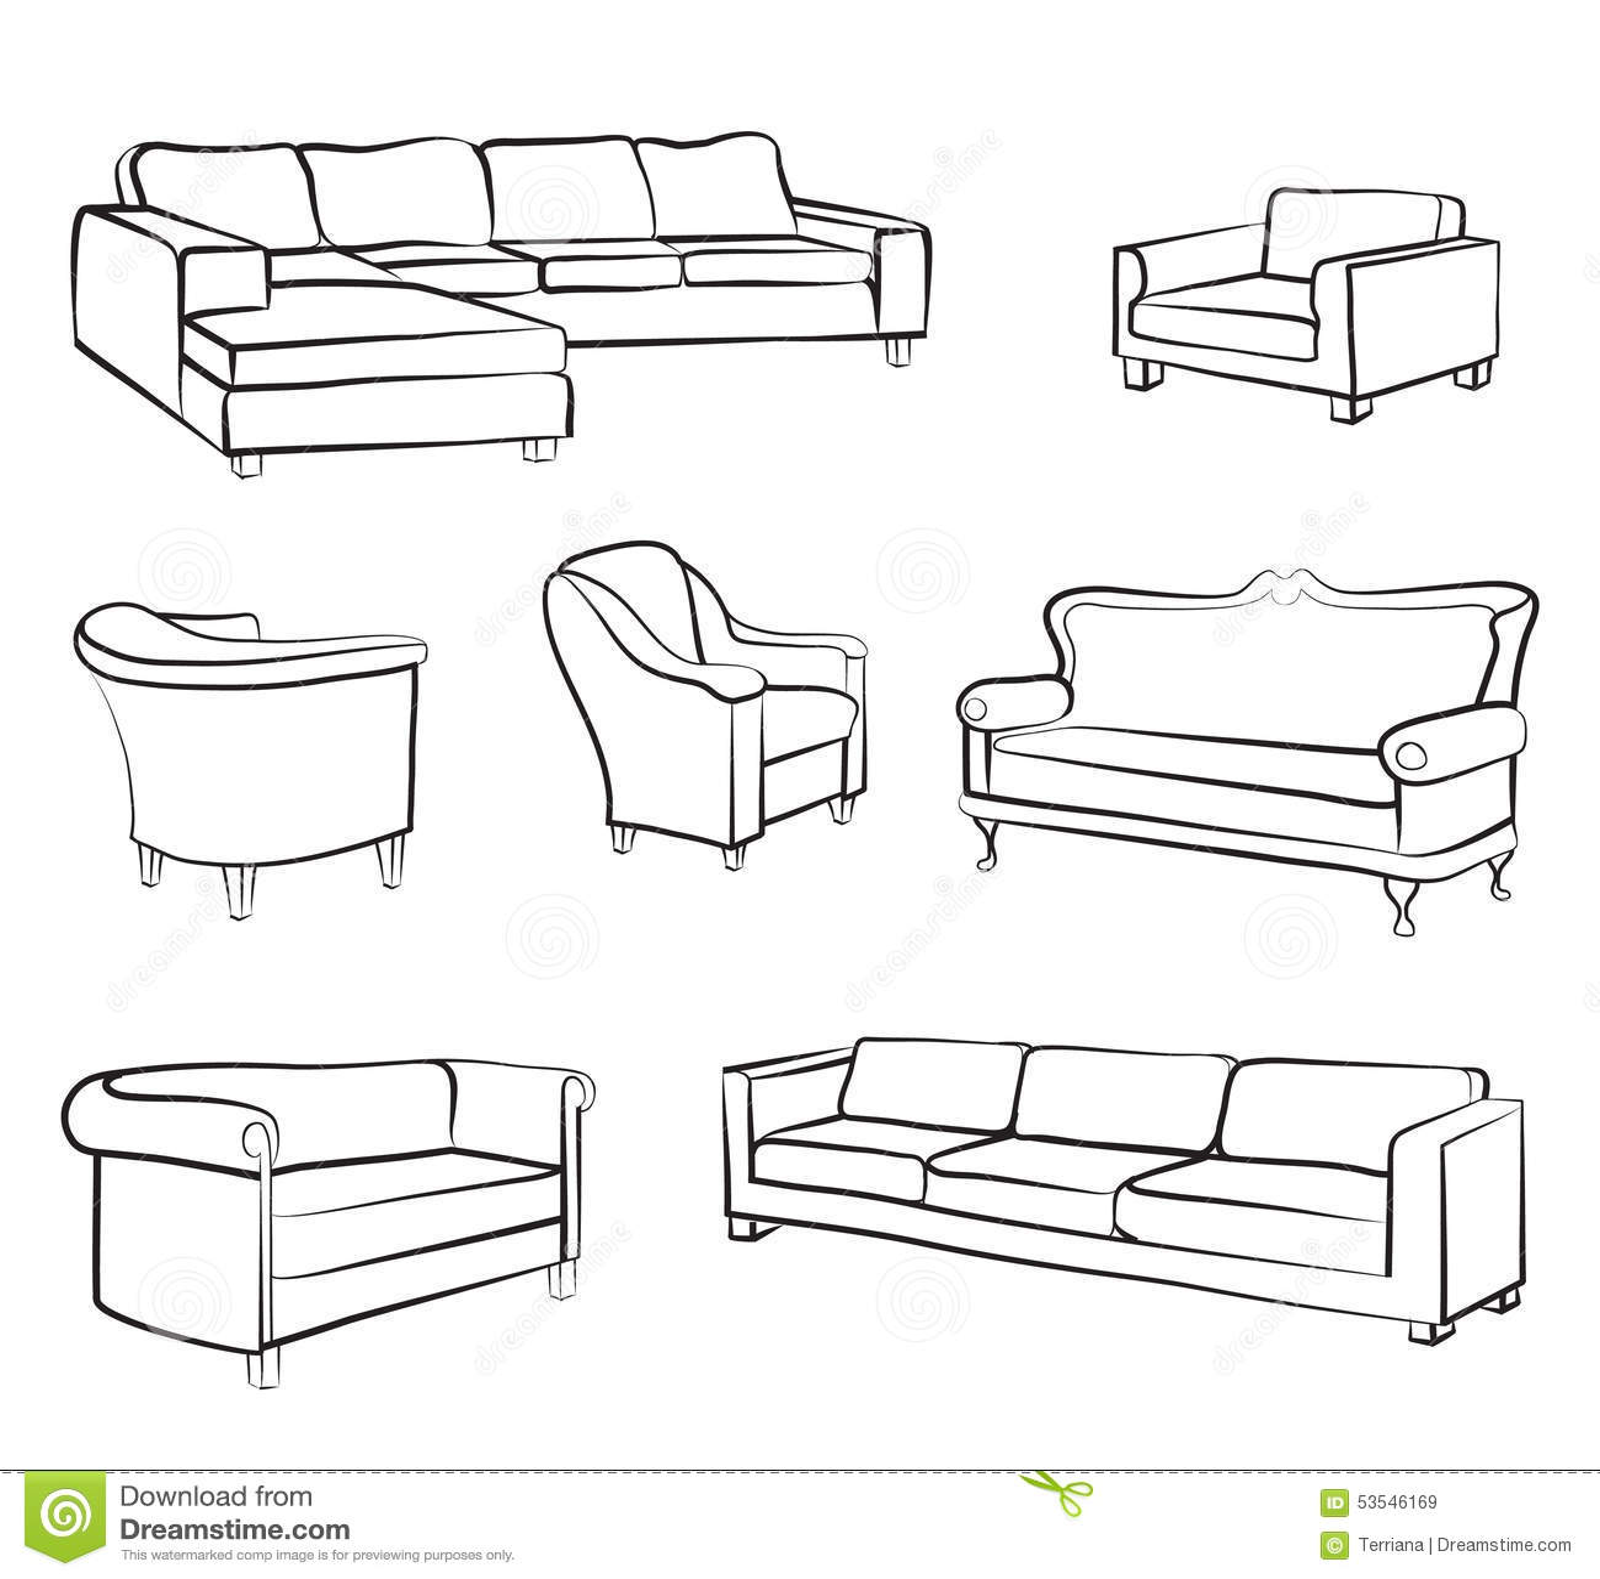 Furniture sofa and armchair set interior design outline for Sofa design sketch